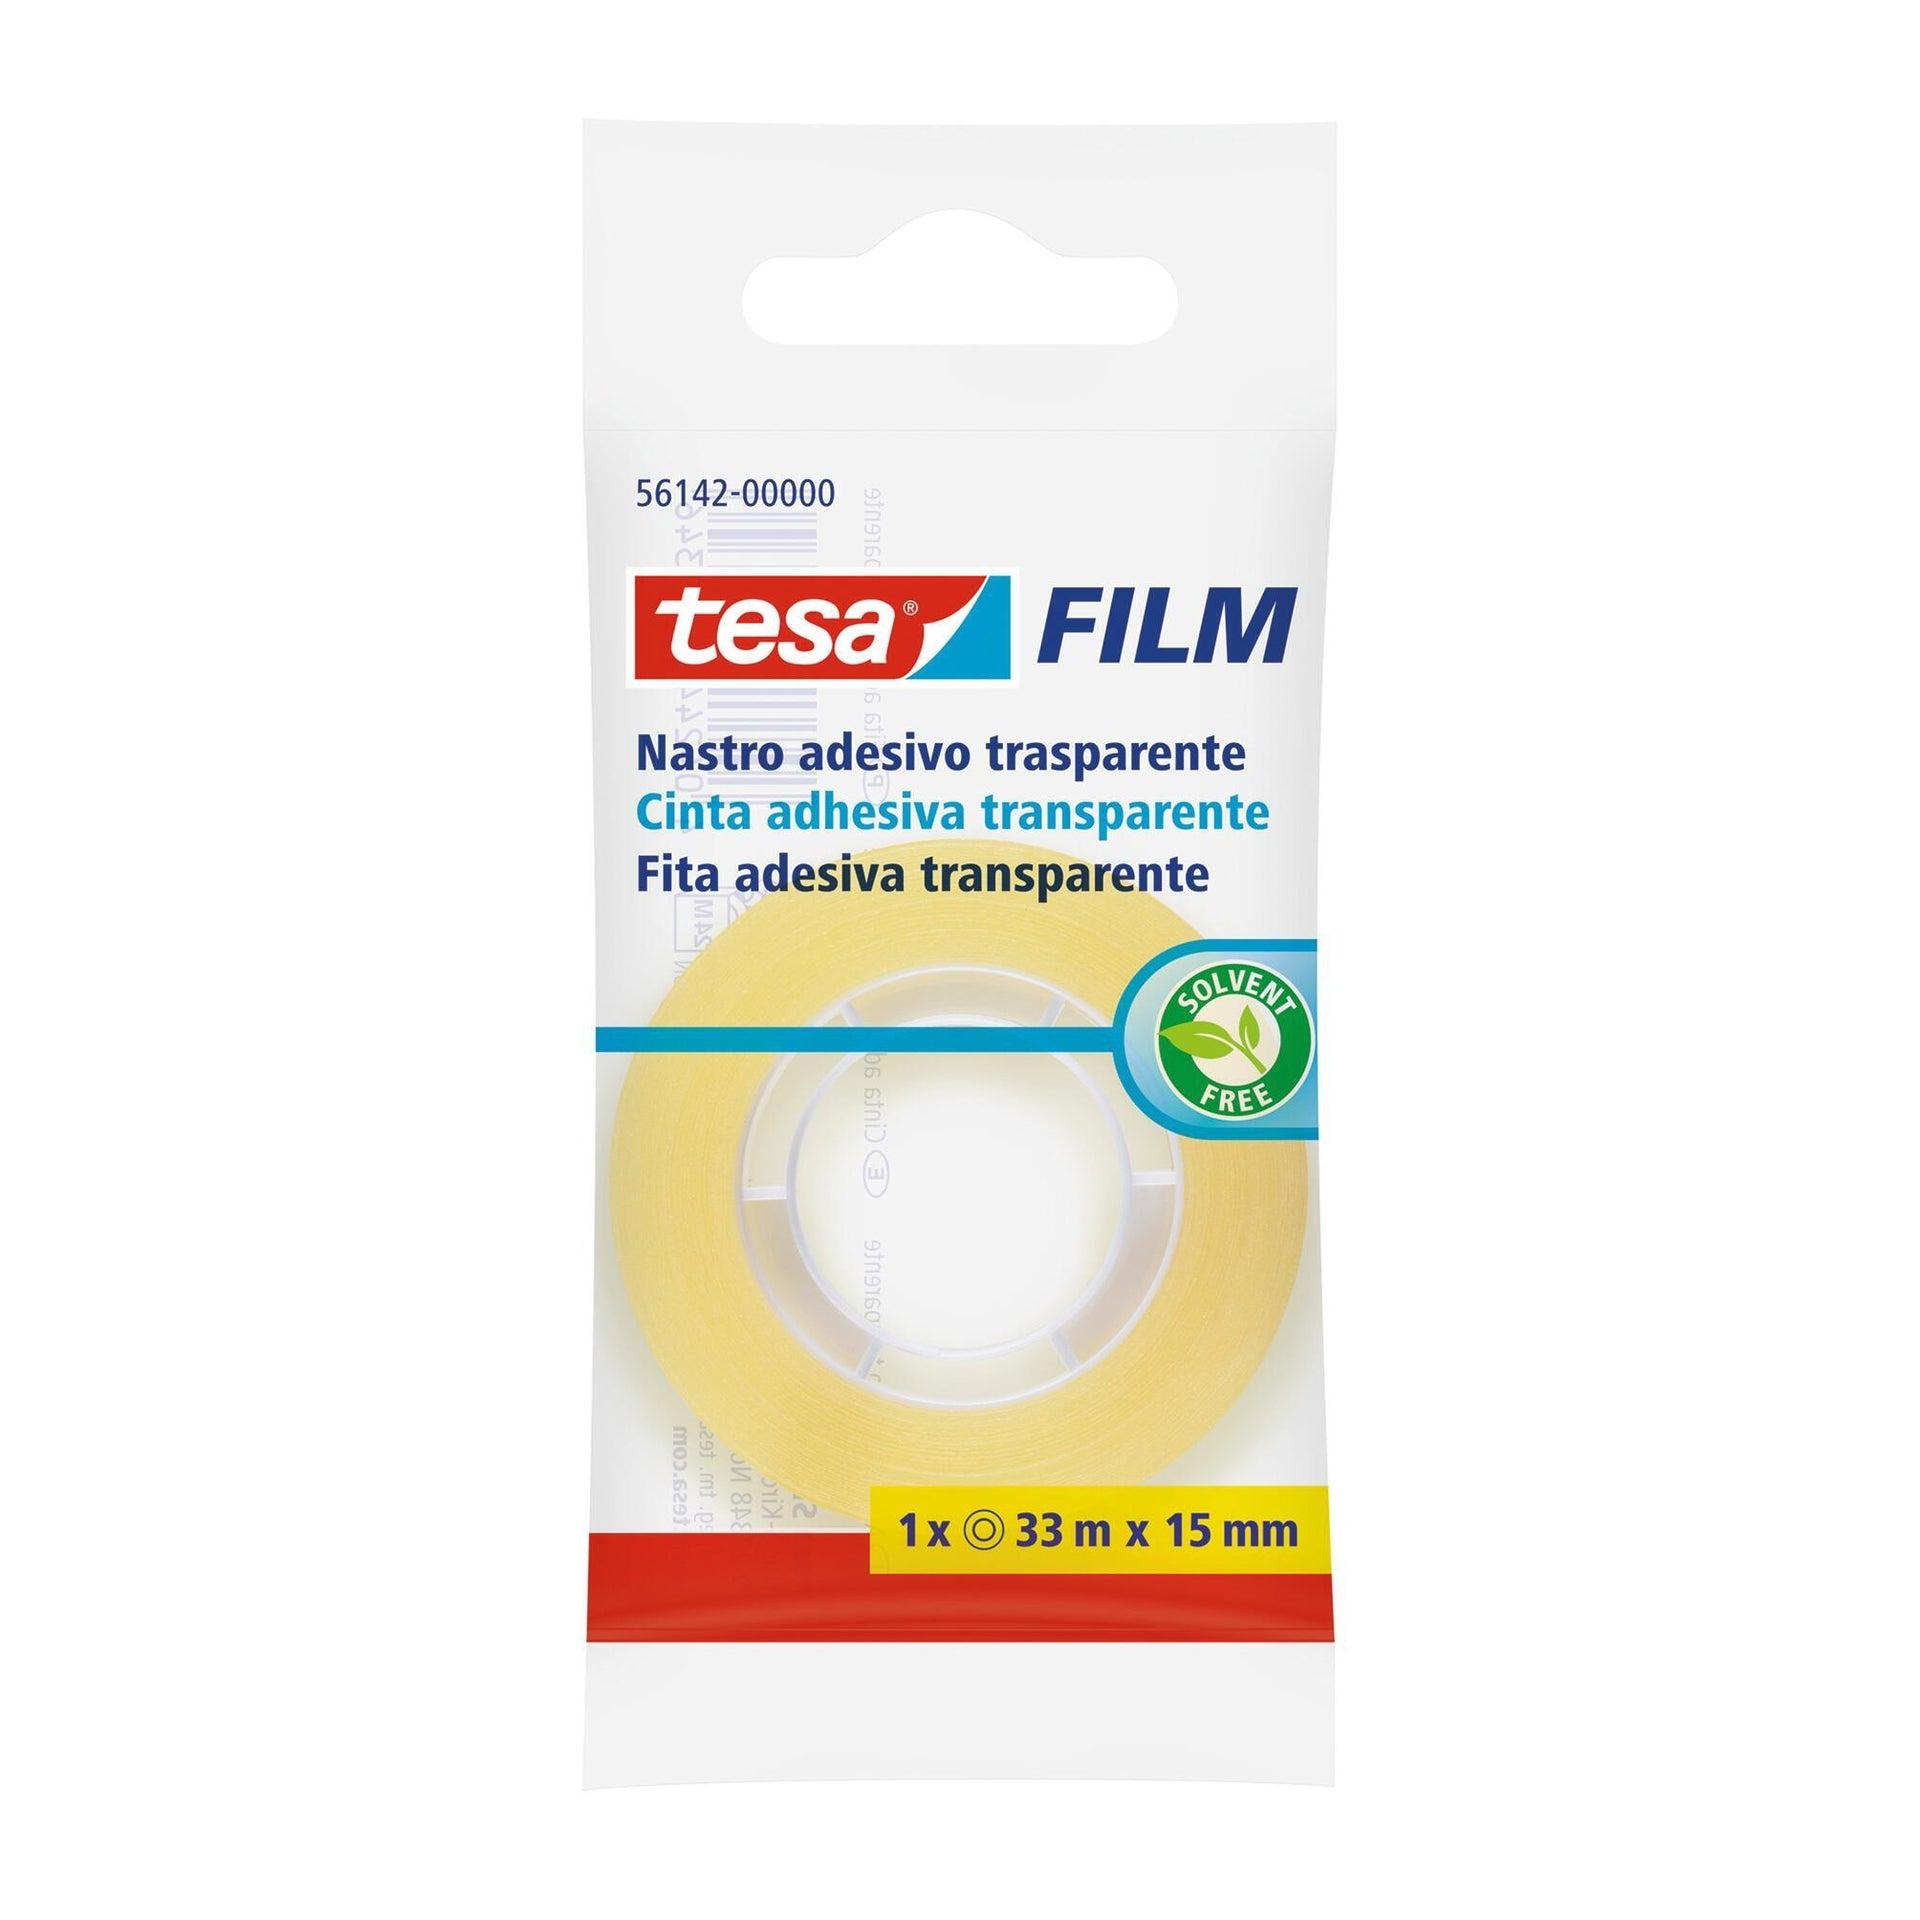 Nastro adesivo TESA tesafilm 15 mm x 0.015 m trasparente - 6